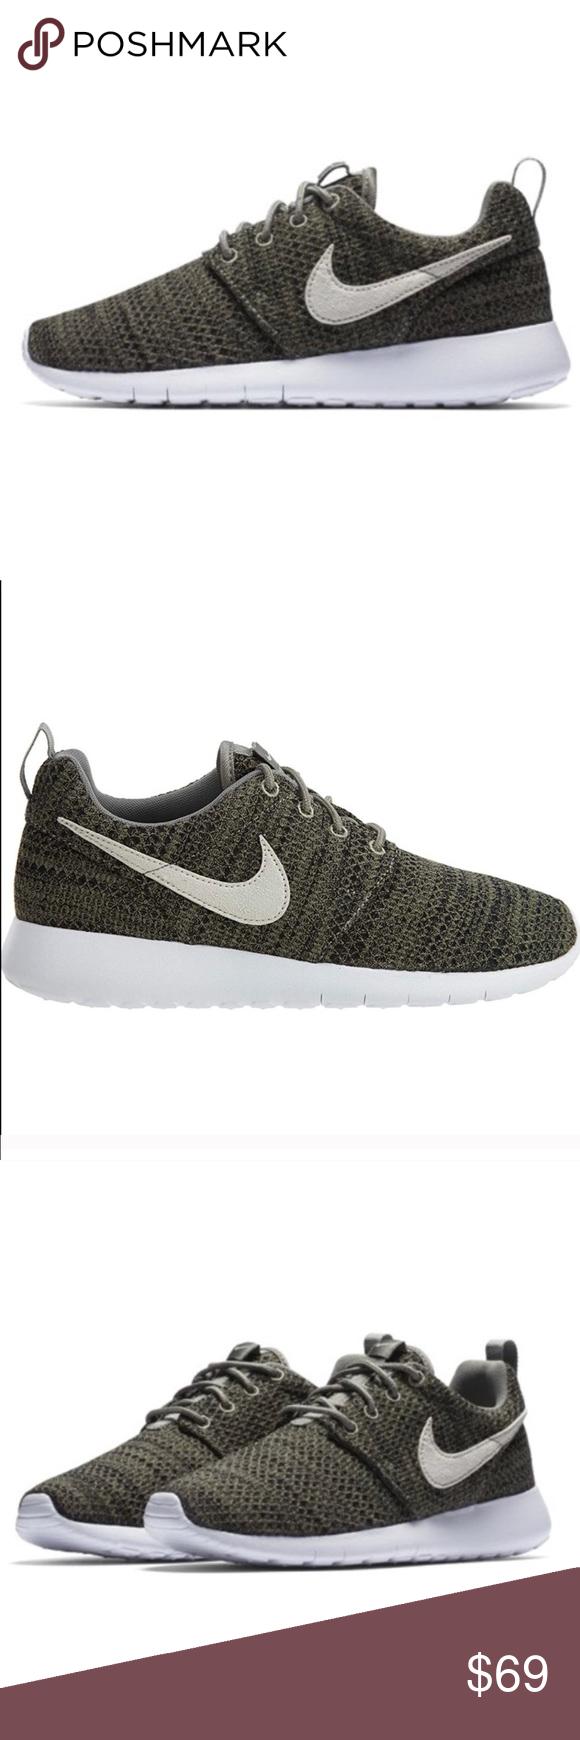 Nike Roshe One Womens Olive Green Shoes New Nwt Green Shoes Olive Green Shoes Shoes